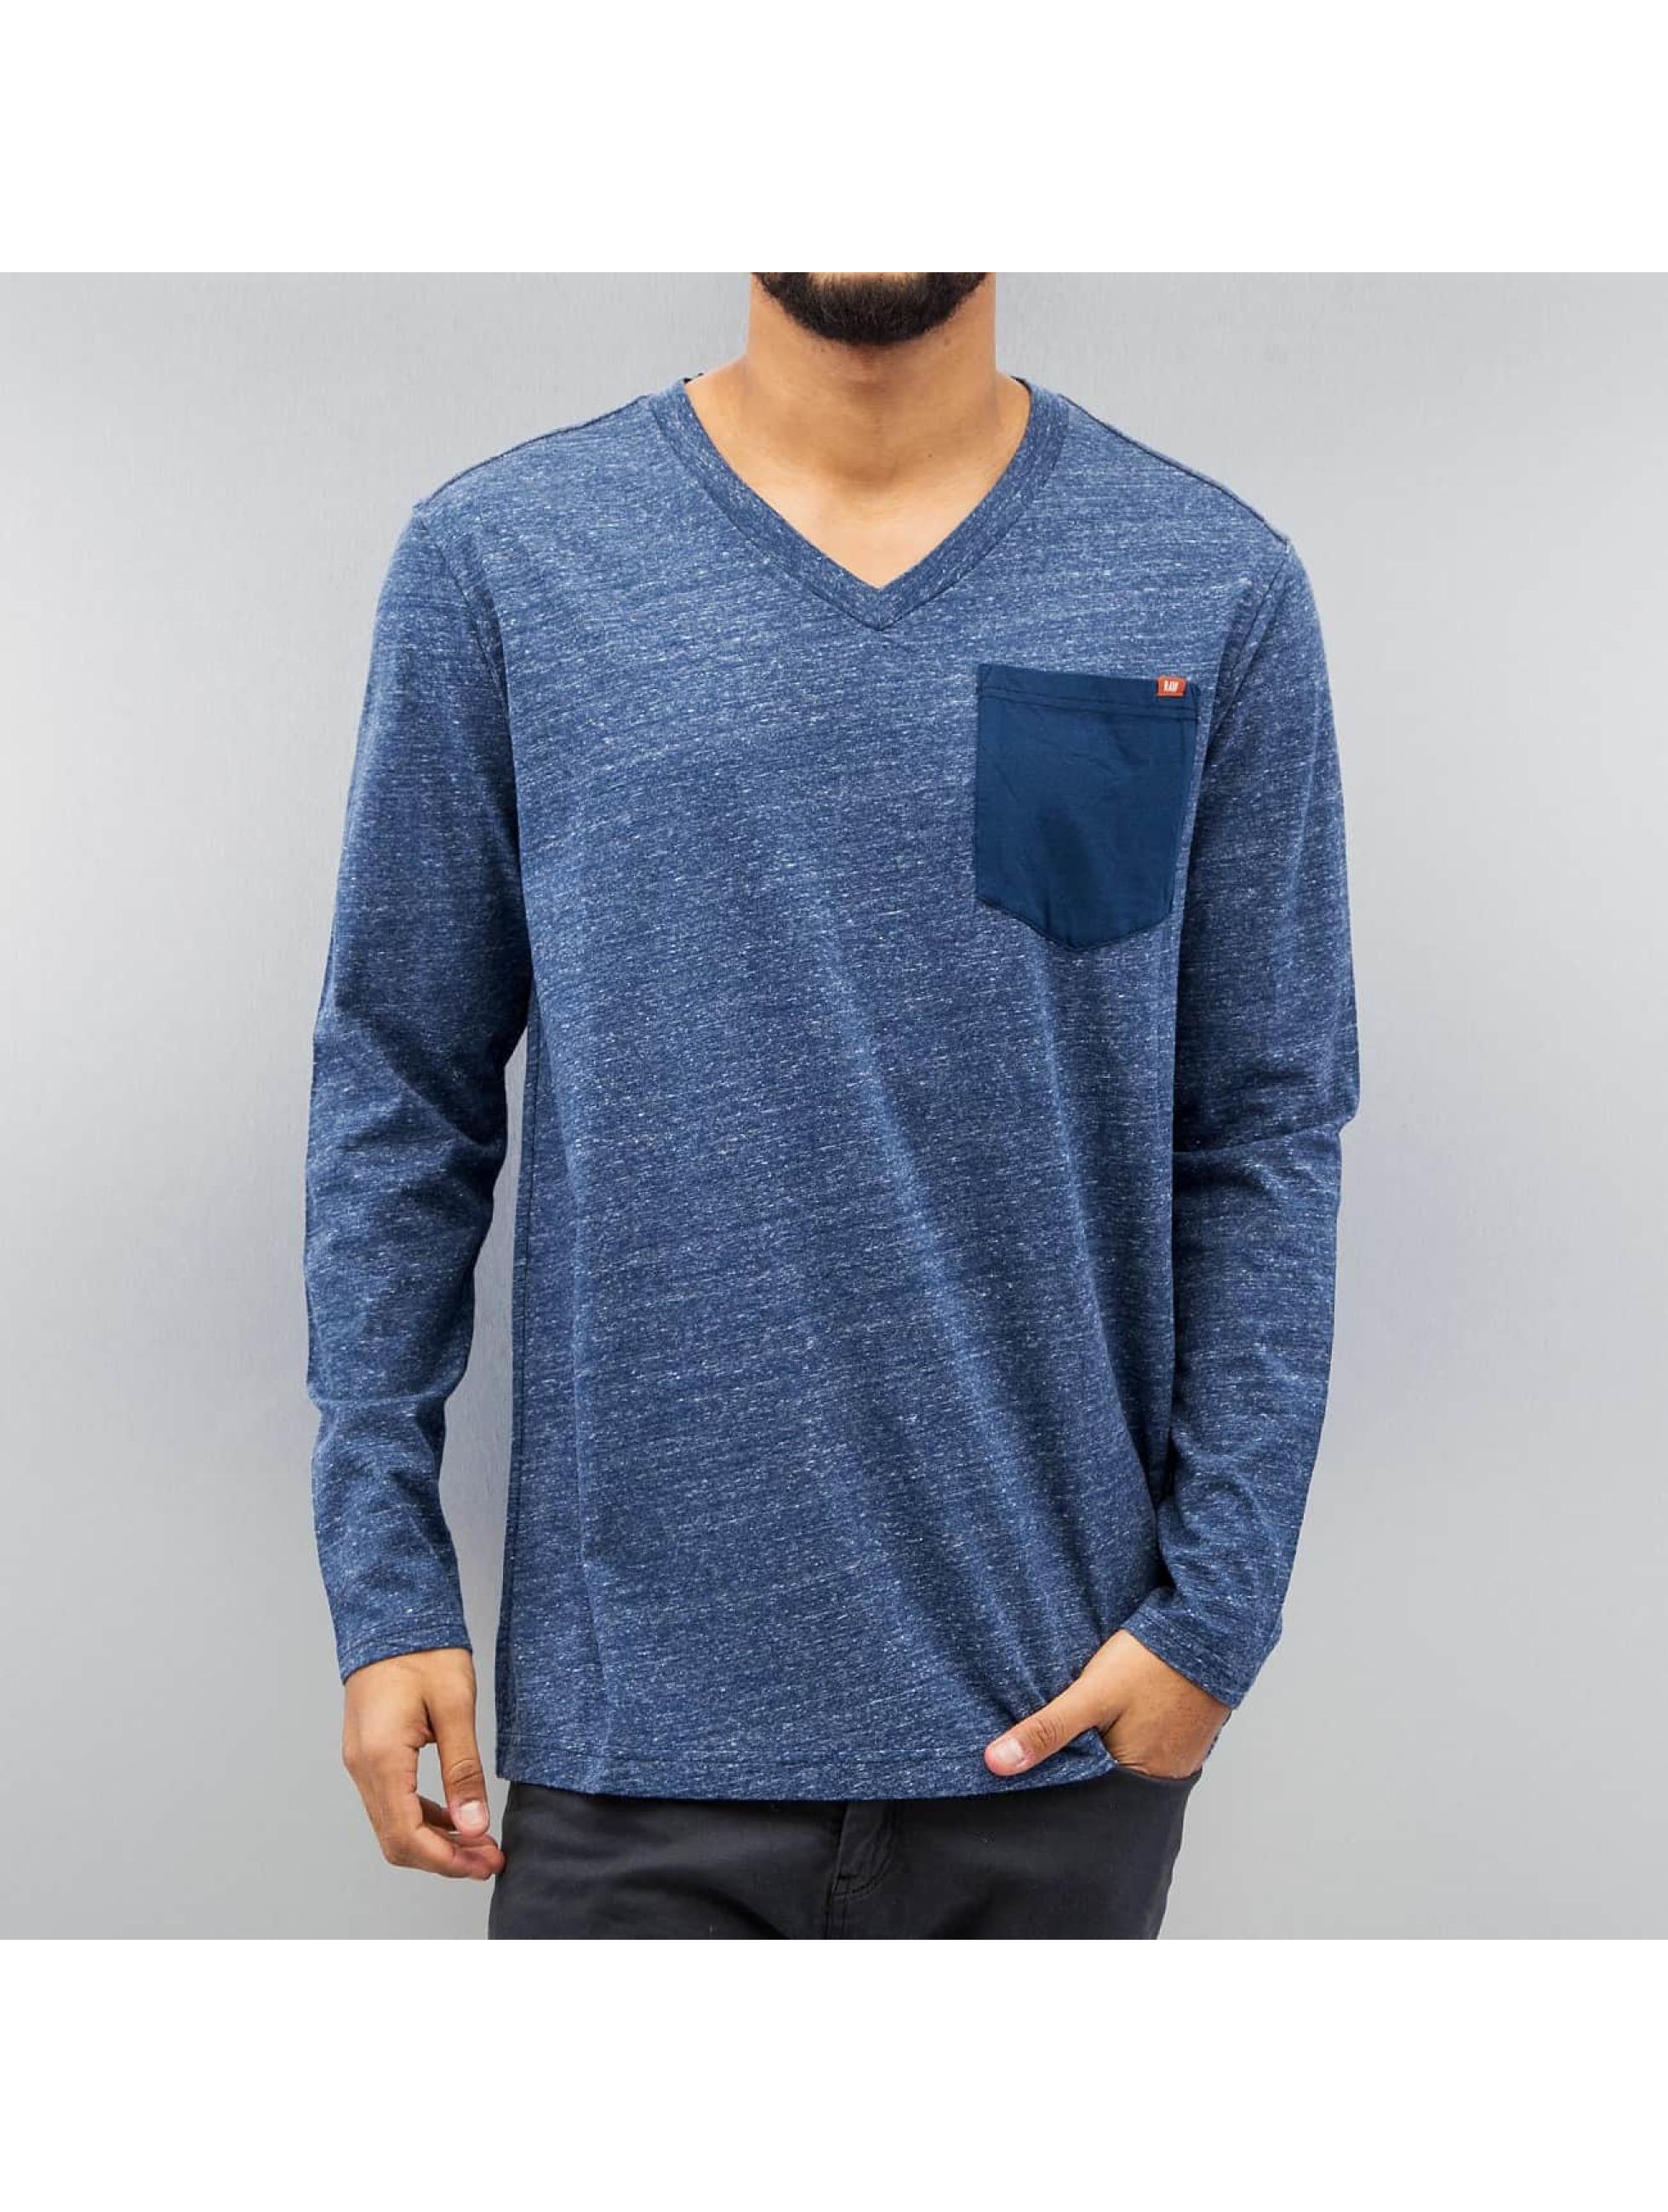 G-Star T-Shirt manches longues Riban Pocket Premium Compact Jersey bleu